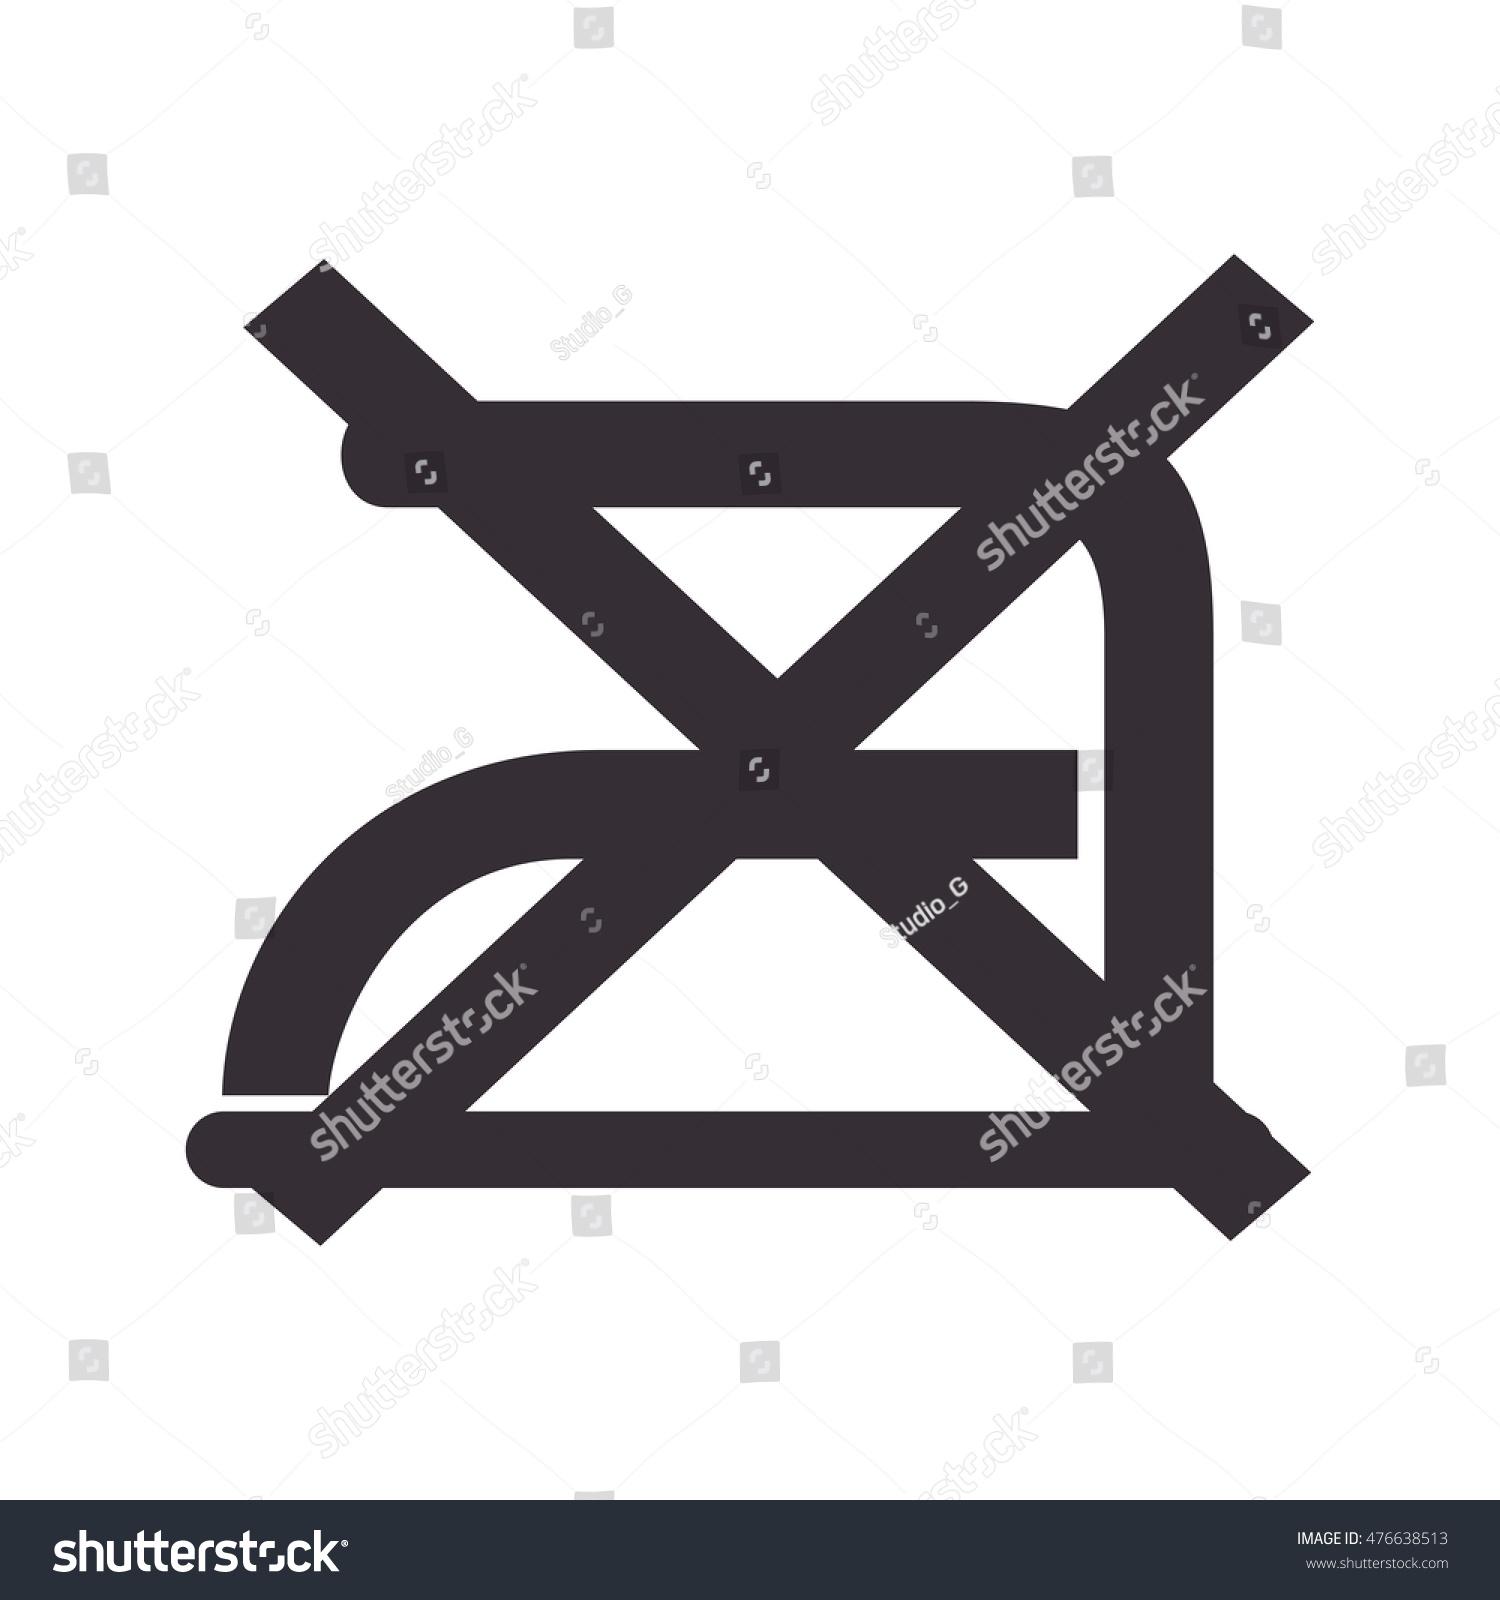 Do Not Iron Instruction Symbol Clothing Stock Vector 476638513